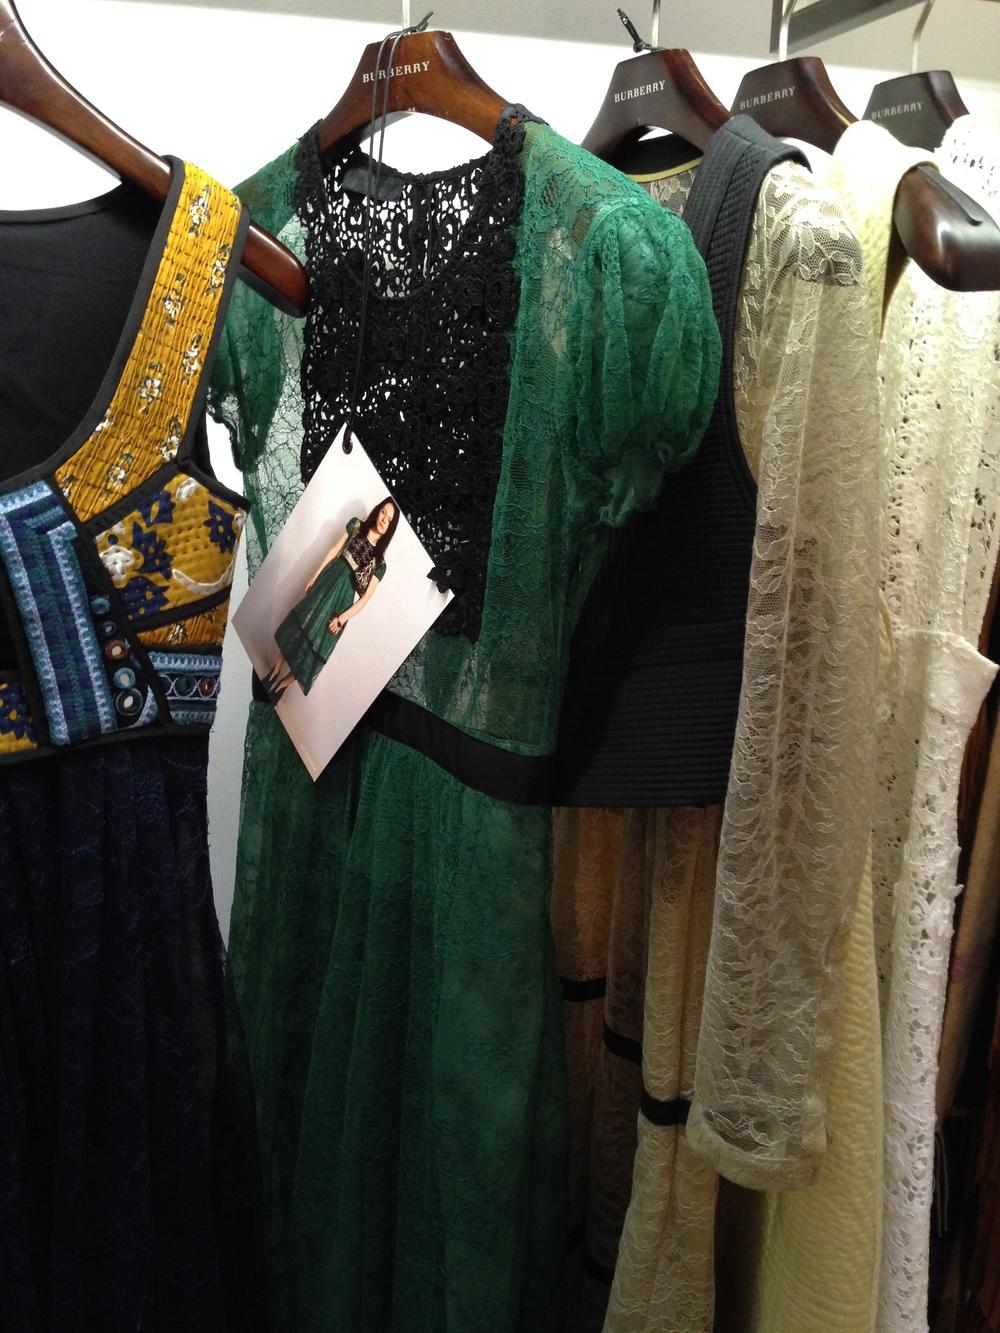 The Green and Black Lace Dress,Burberry Prorsum Autumn Winter Womenswear 2015